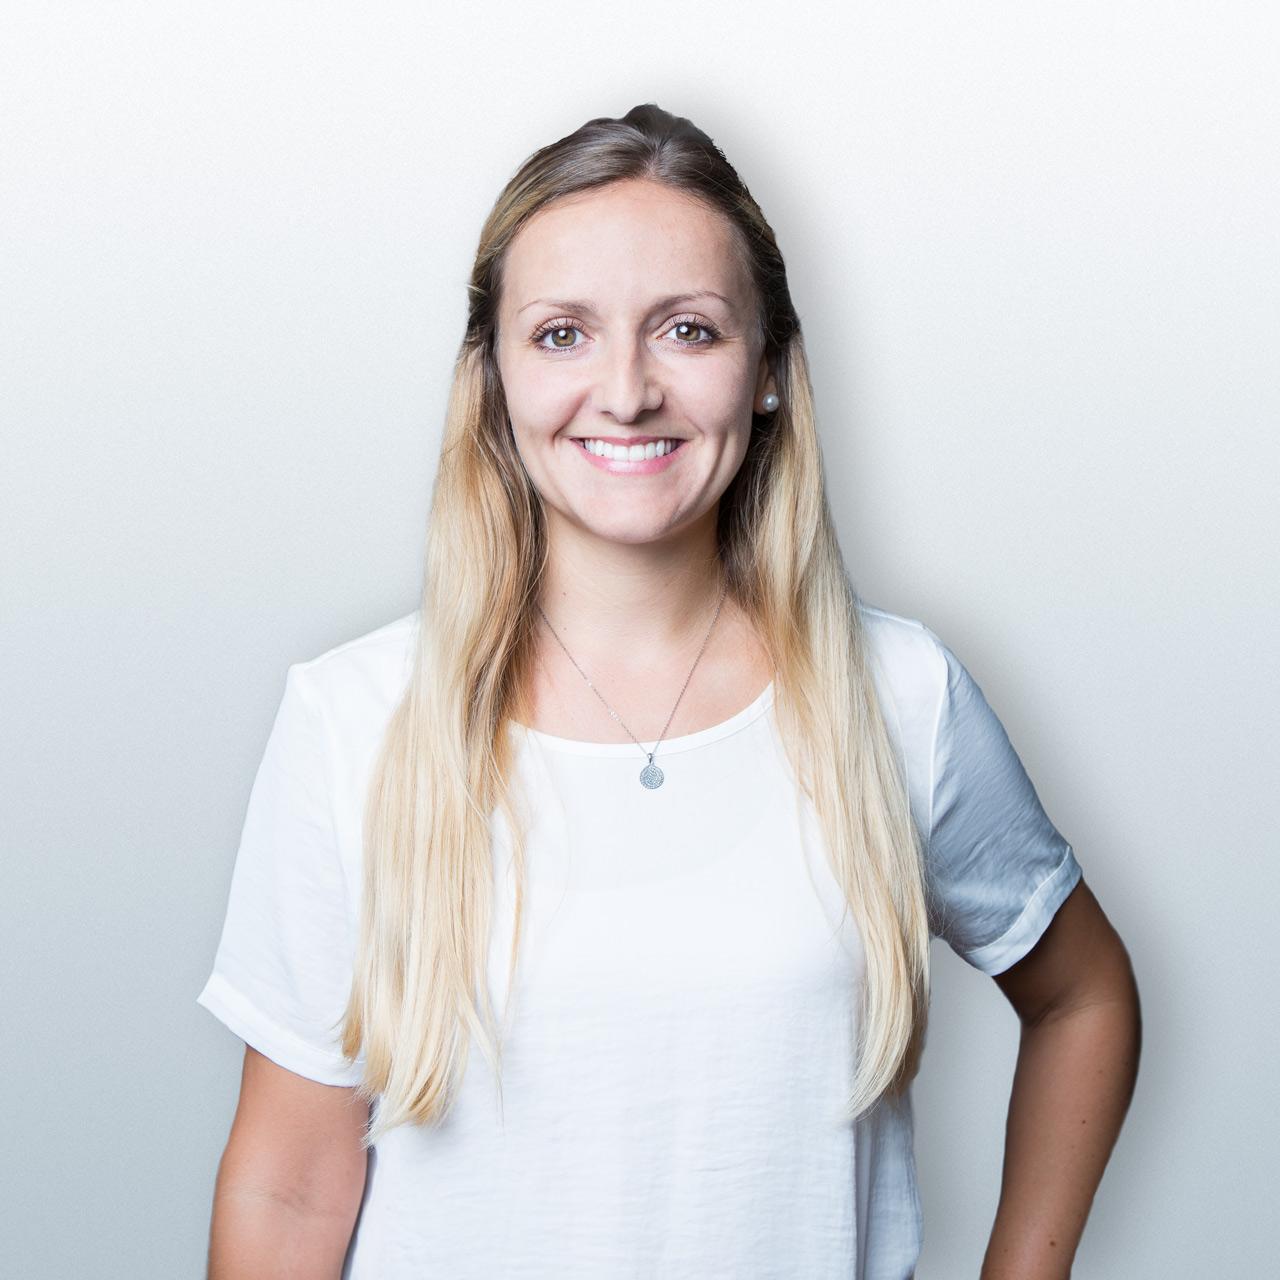 Laura Leuthe